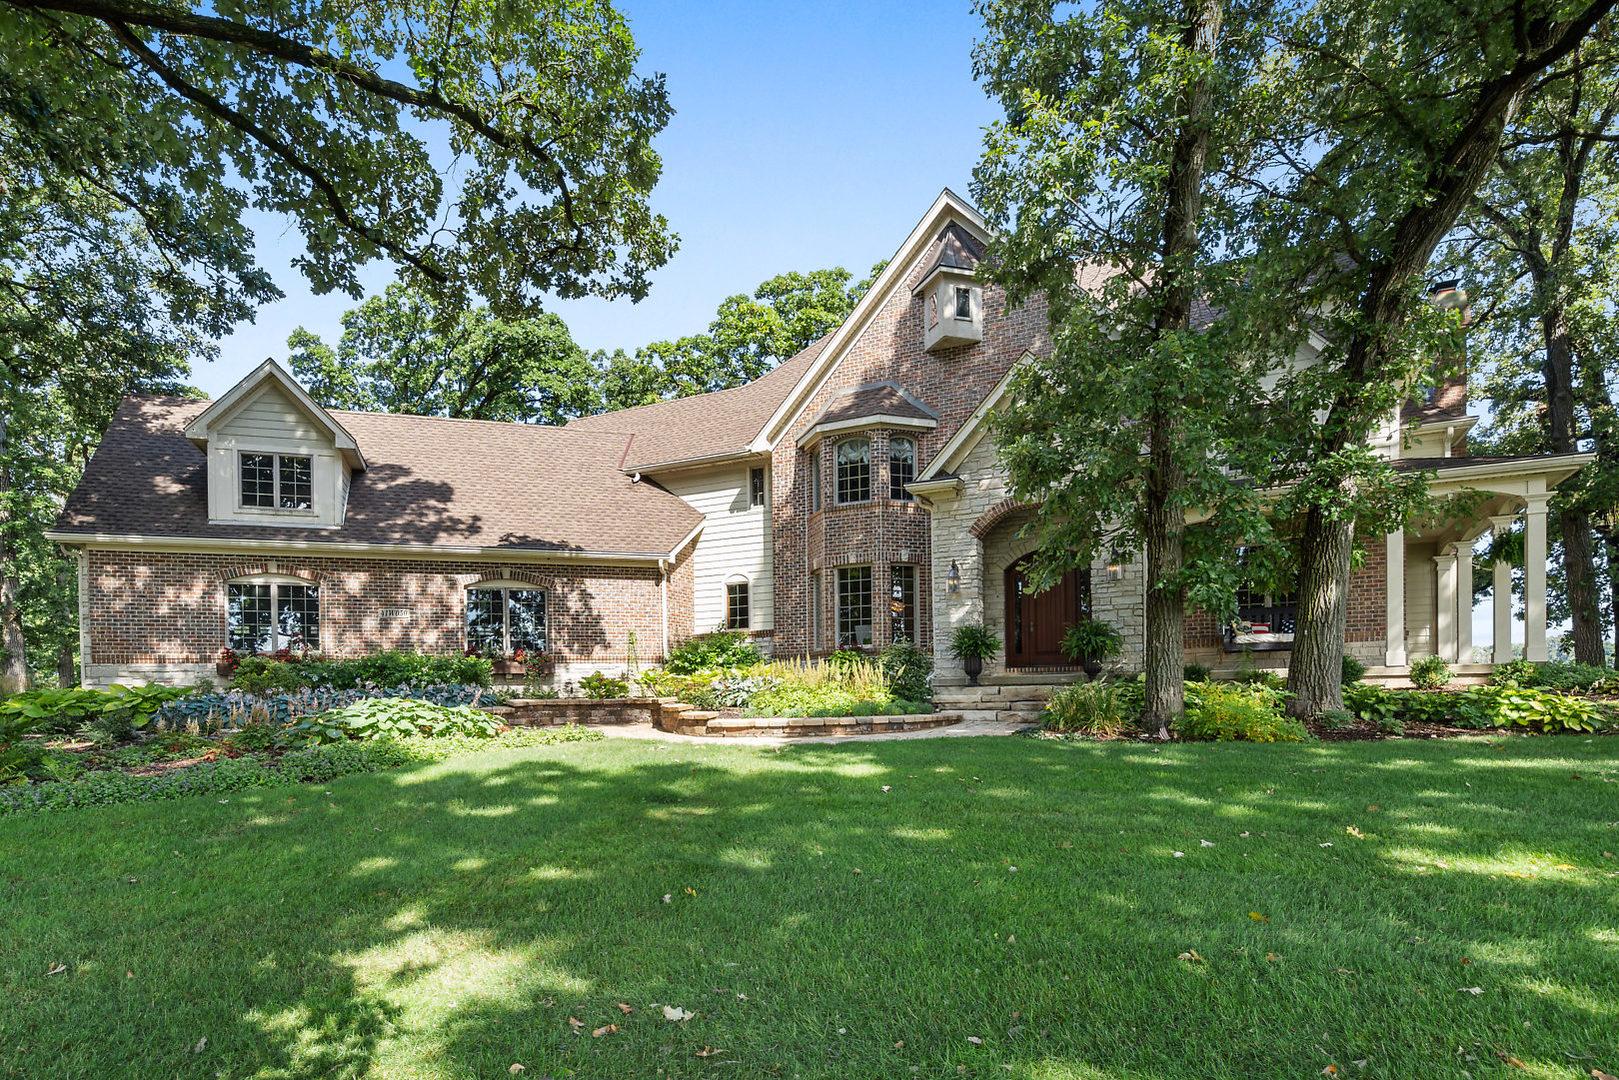 41W050  Stoneridge,  ELGIN, Illinois